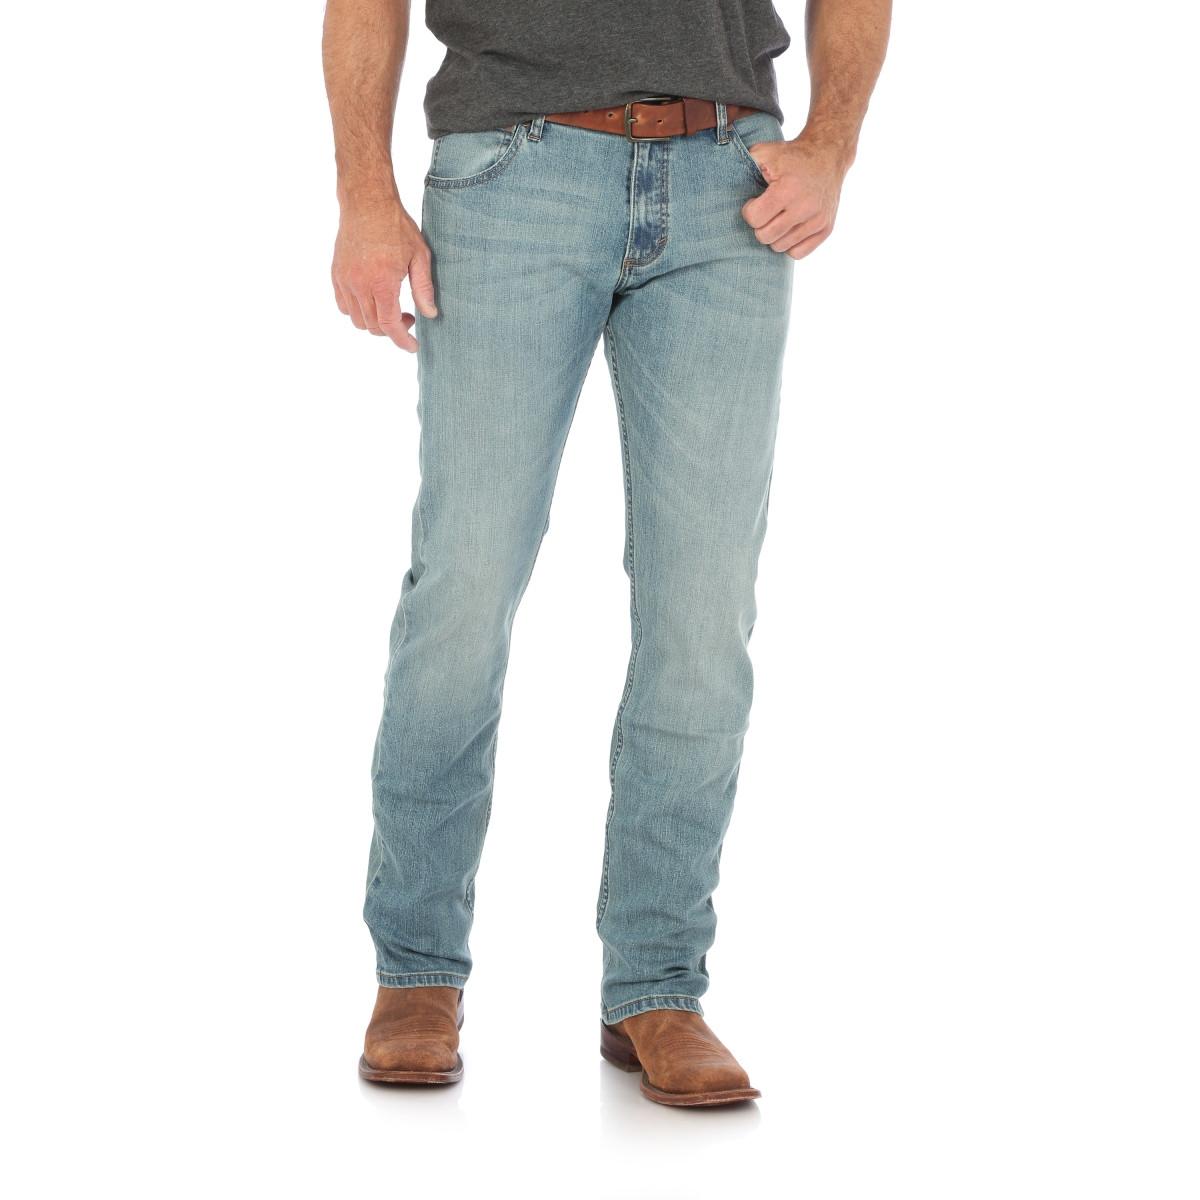 bdde716e ... Wrangler Retro® Slim Straight Jean light Wash. Image 1